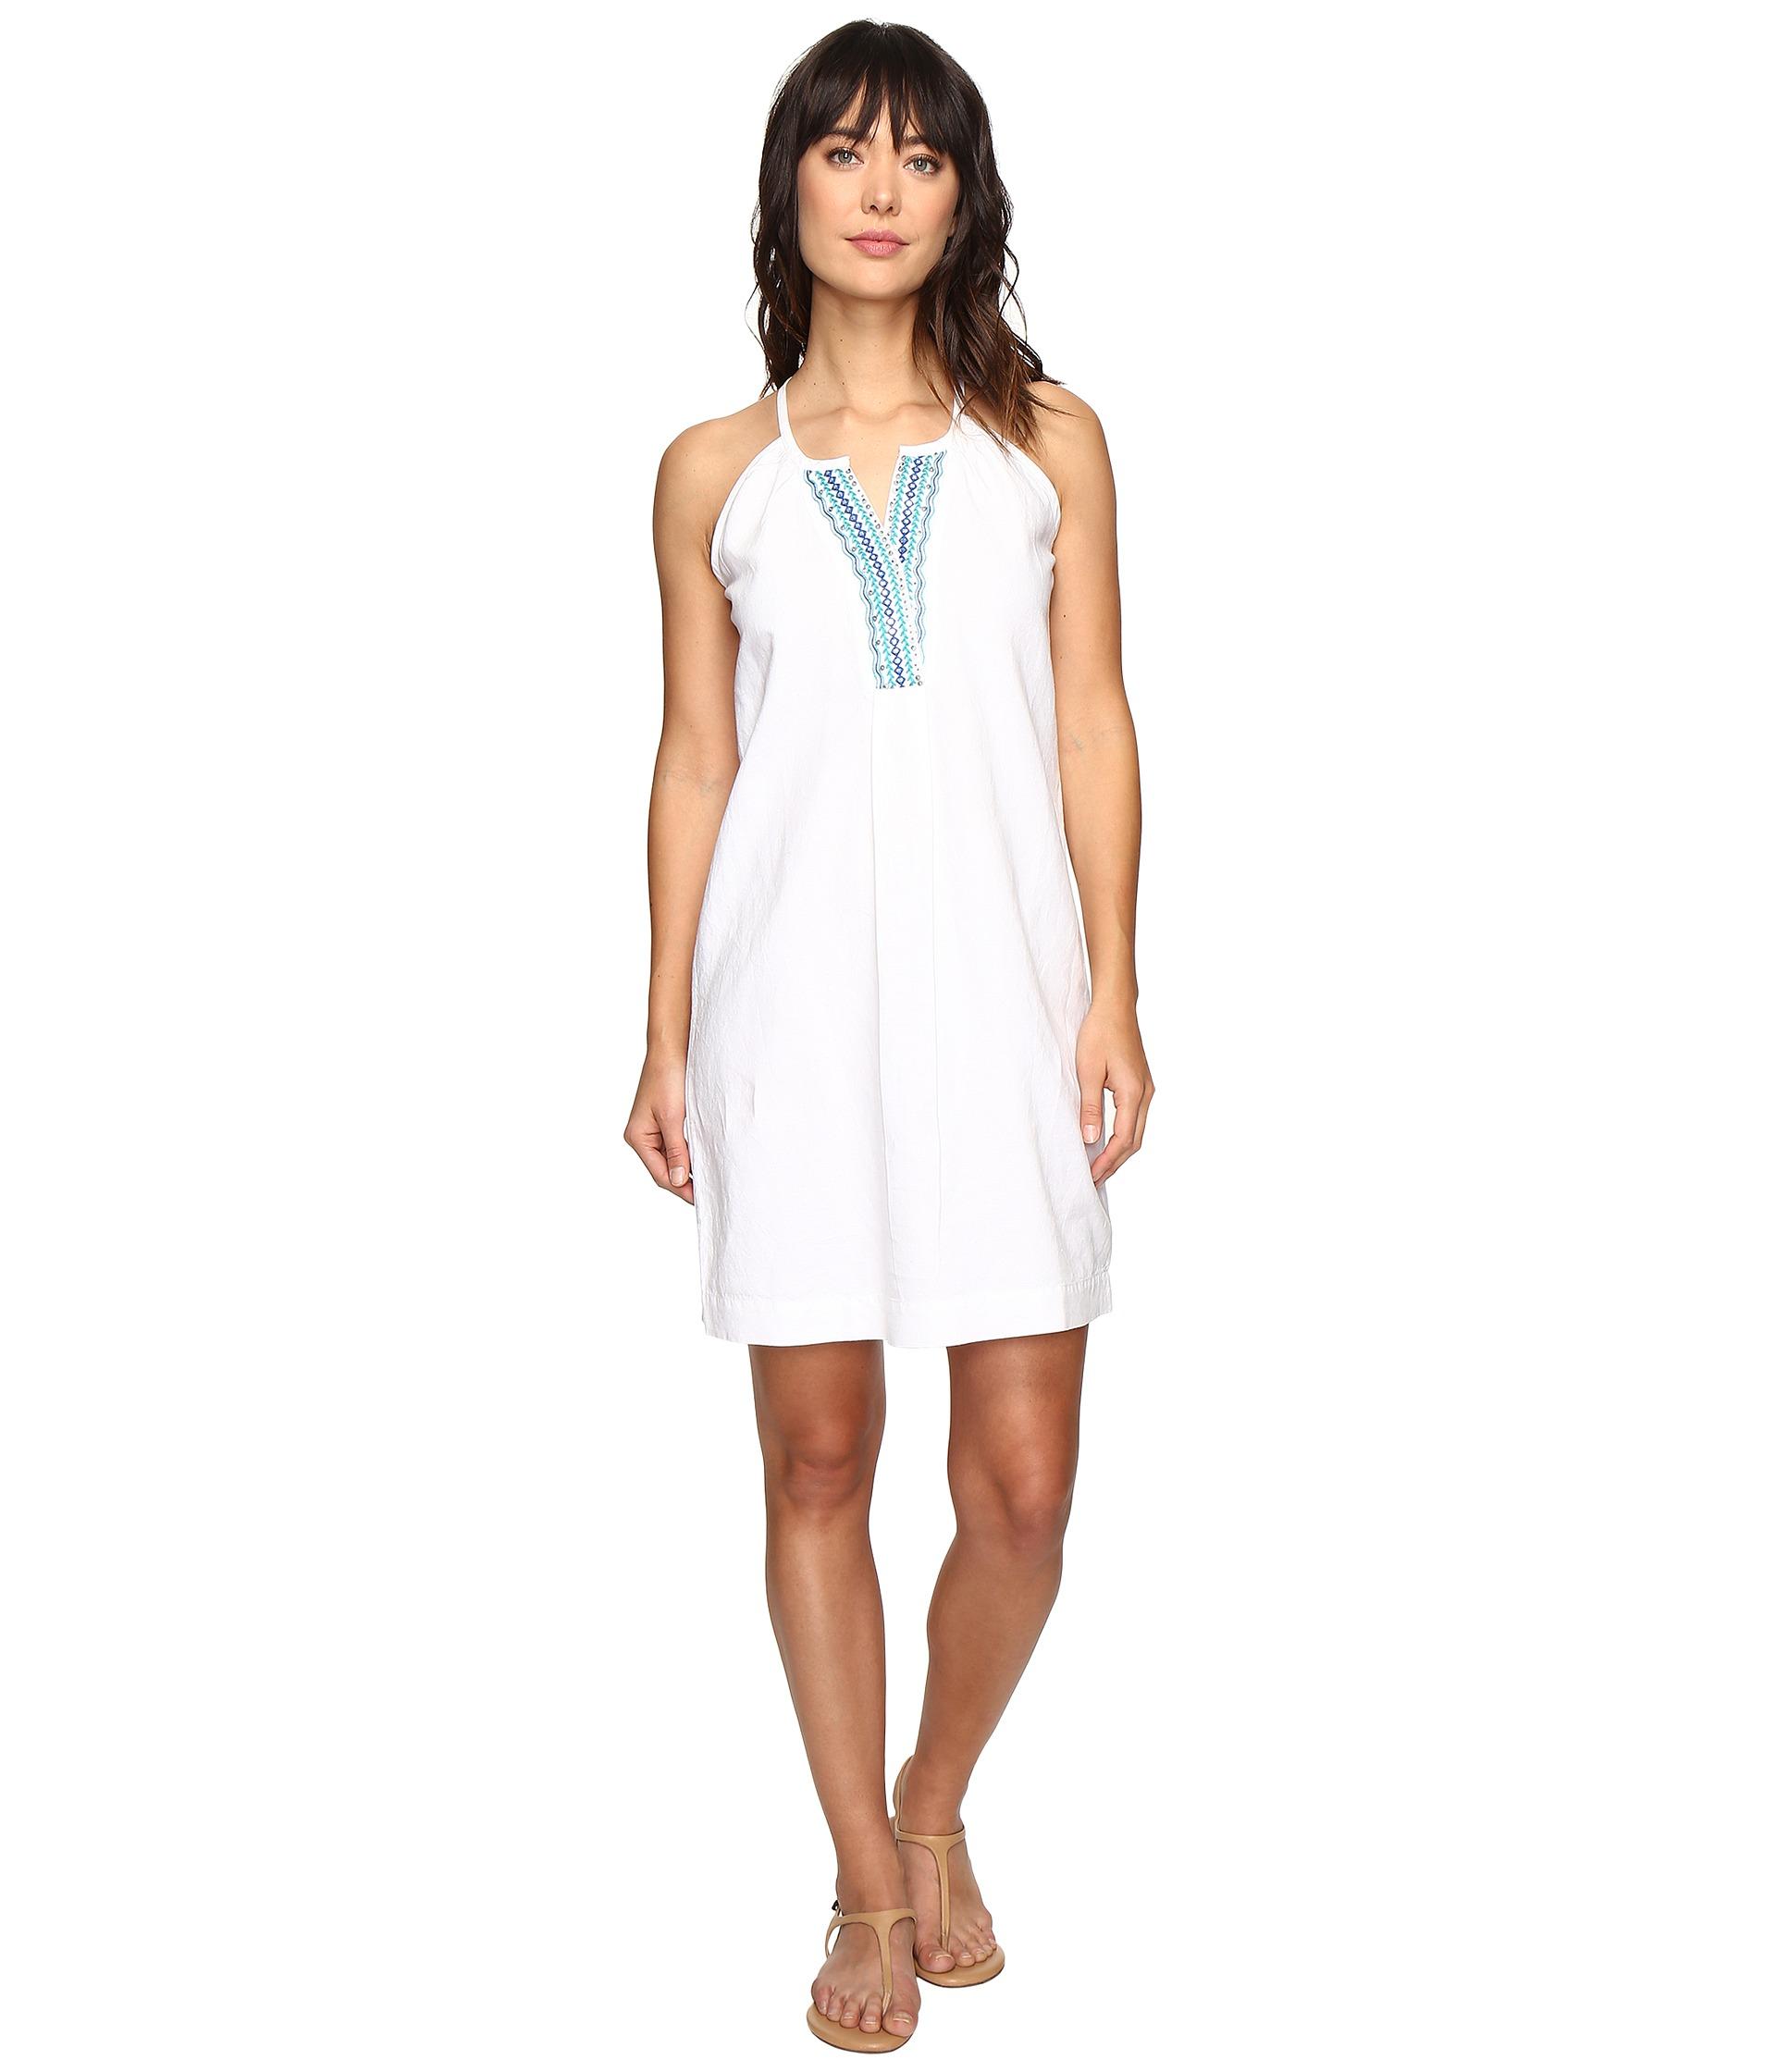 White Linen Dress- White - Shipped Free at Zappos